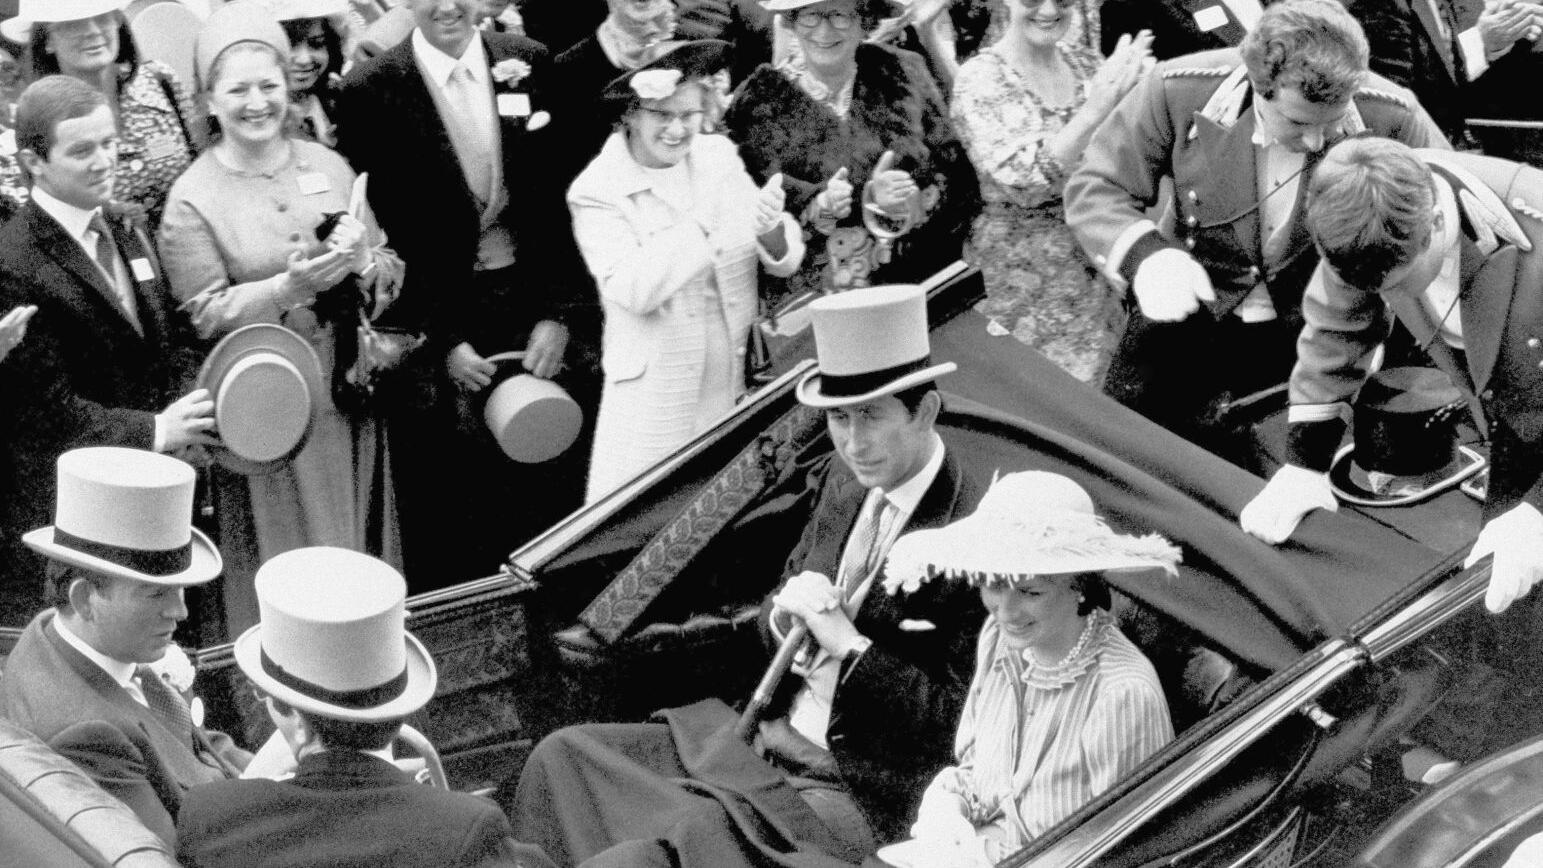 Princess DianaPrince Charles